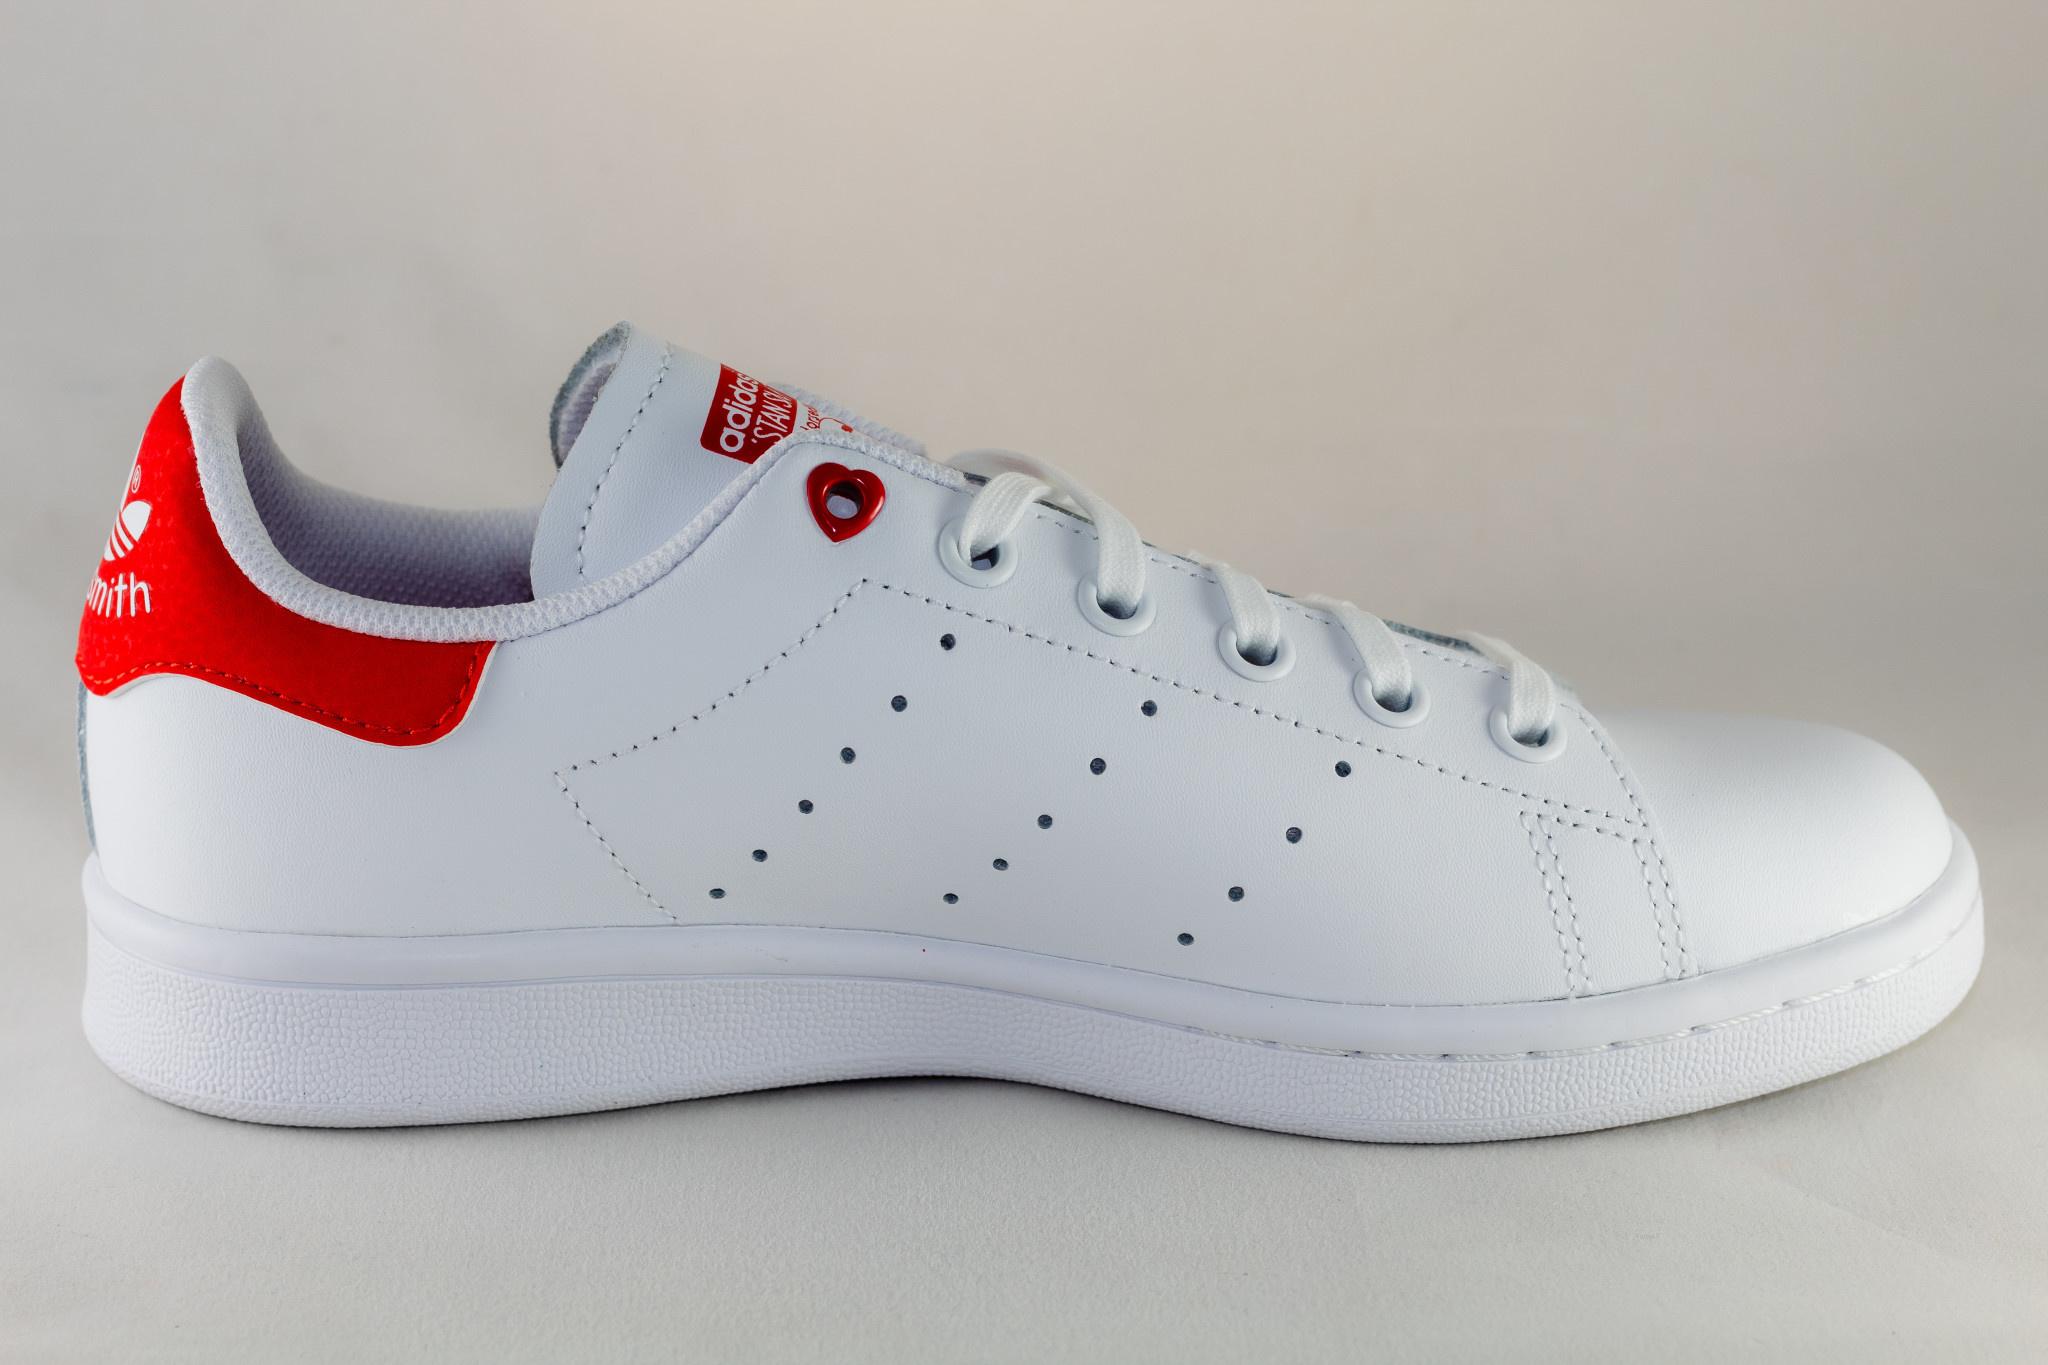 Adidas J ADIDAS STAN SMITH Ftwwht/ Ftwwht/ Actred